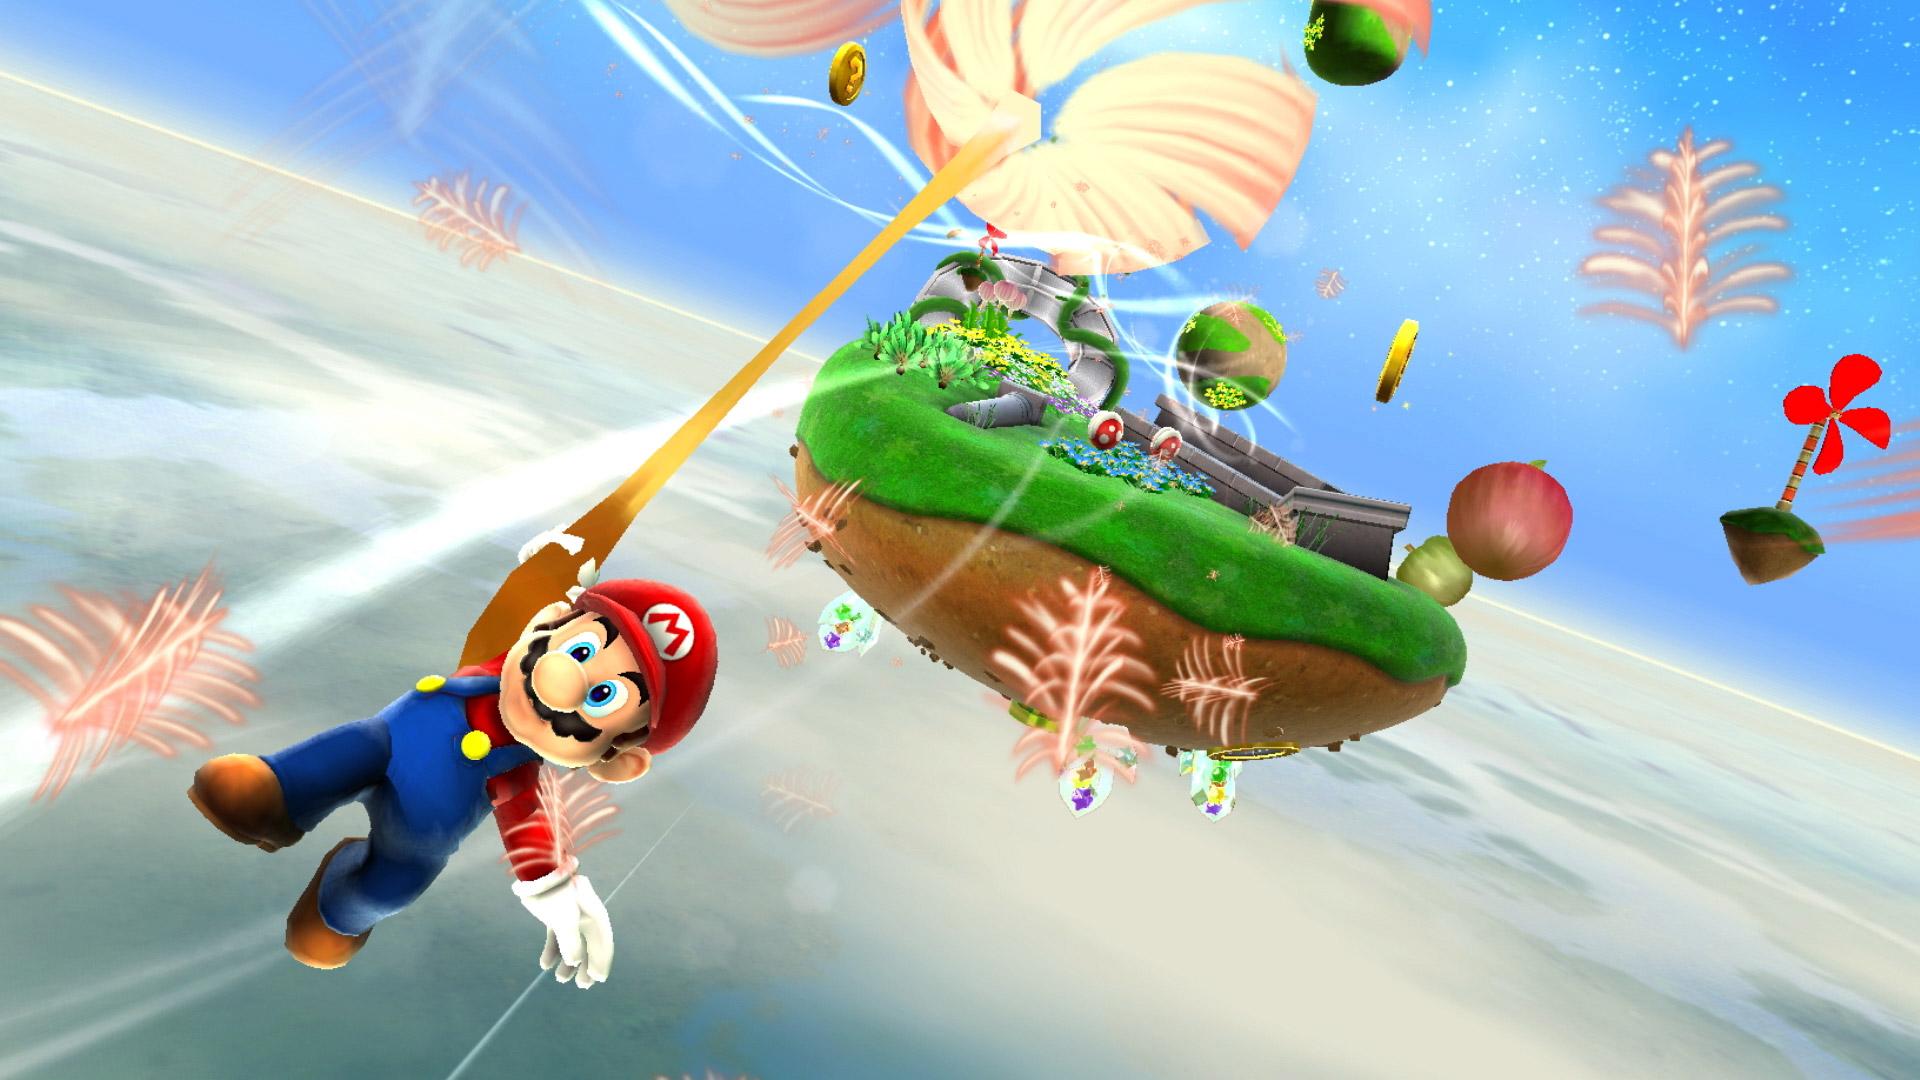 Super Mario 3D All-Stars chega às lojas no dia 18 de setembro.